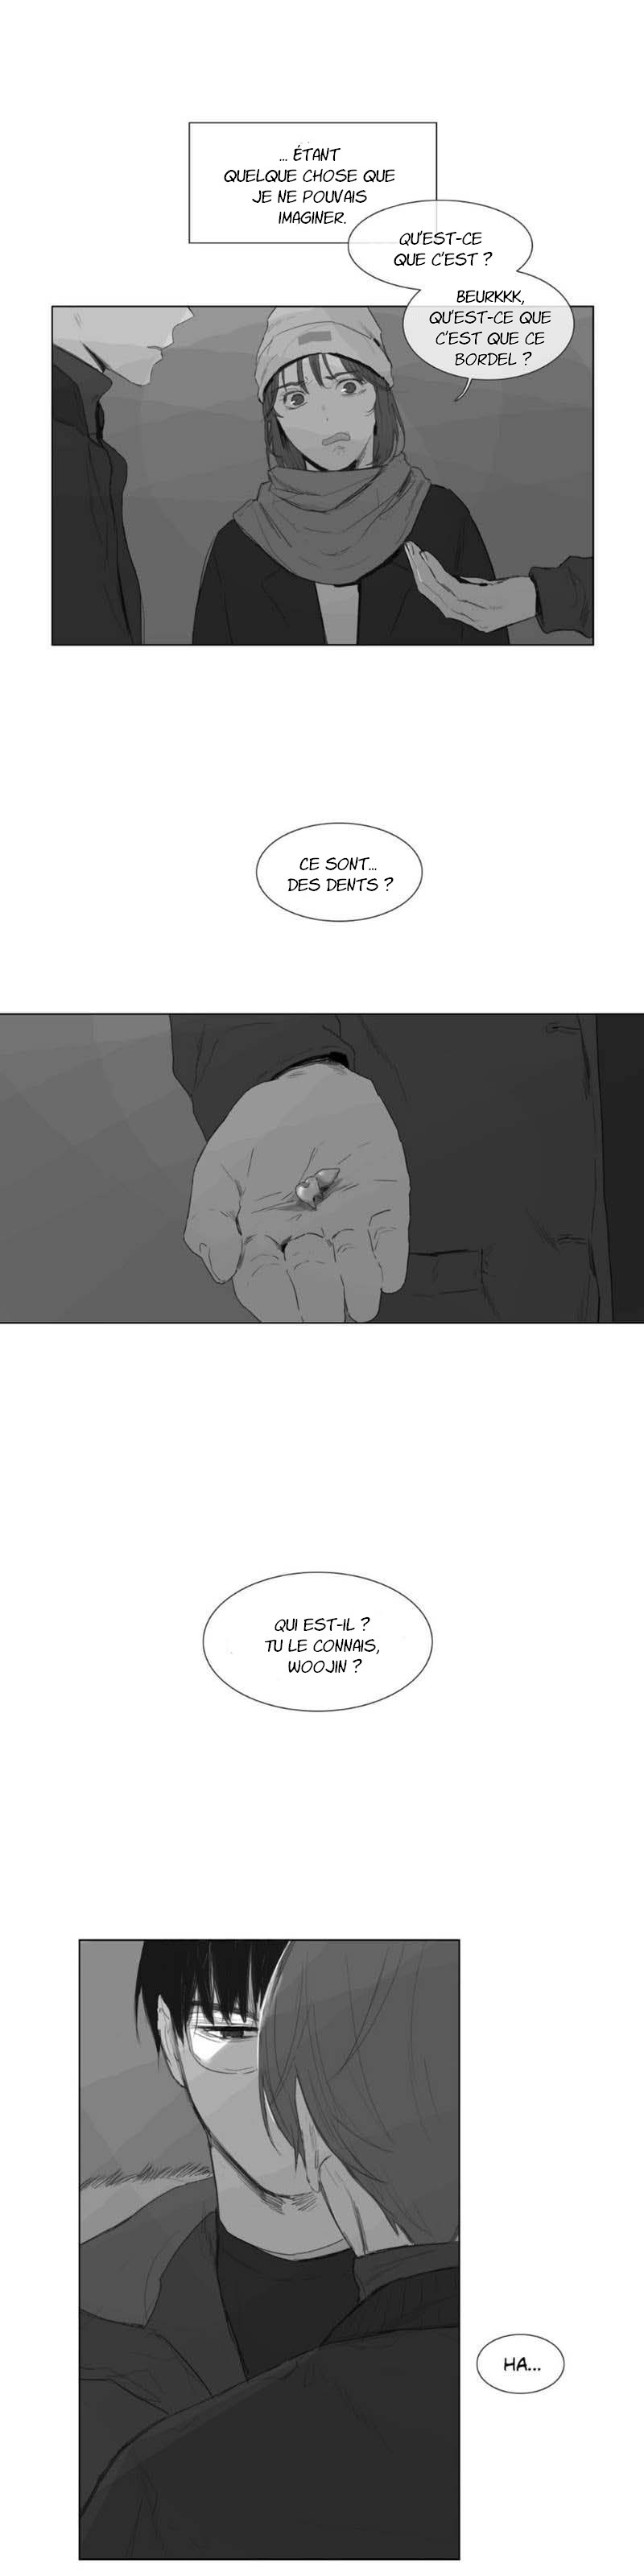 https://nine.mangadogs.com/fr_manga/pic2/8/11400/510753/EscapeintoObliviousChapitr_9_144.jpg Page 10